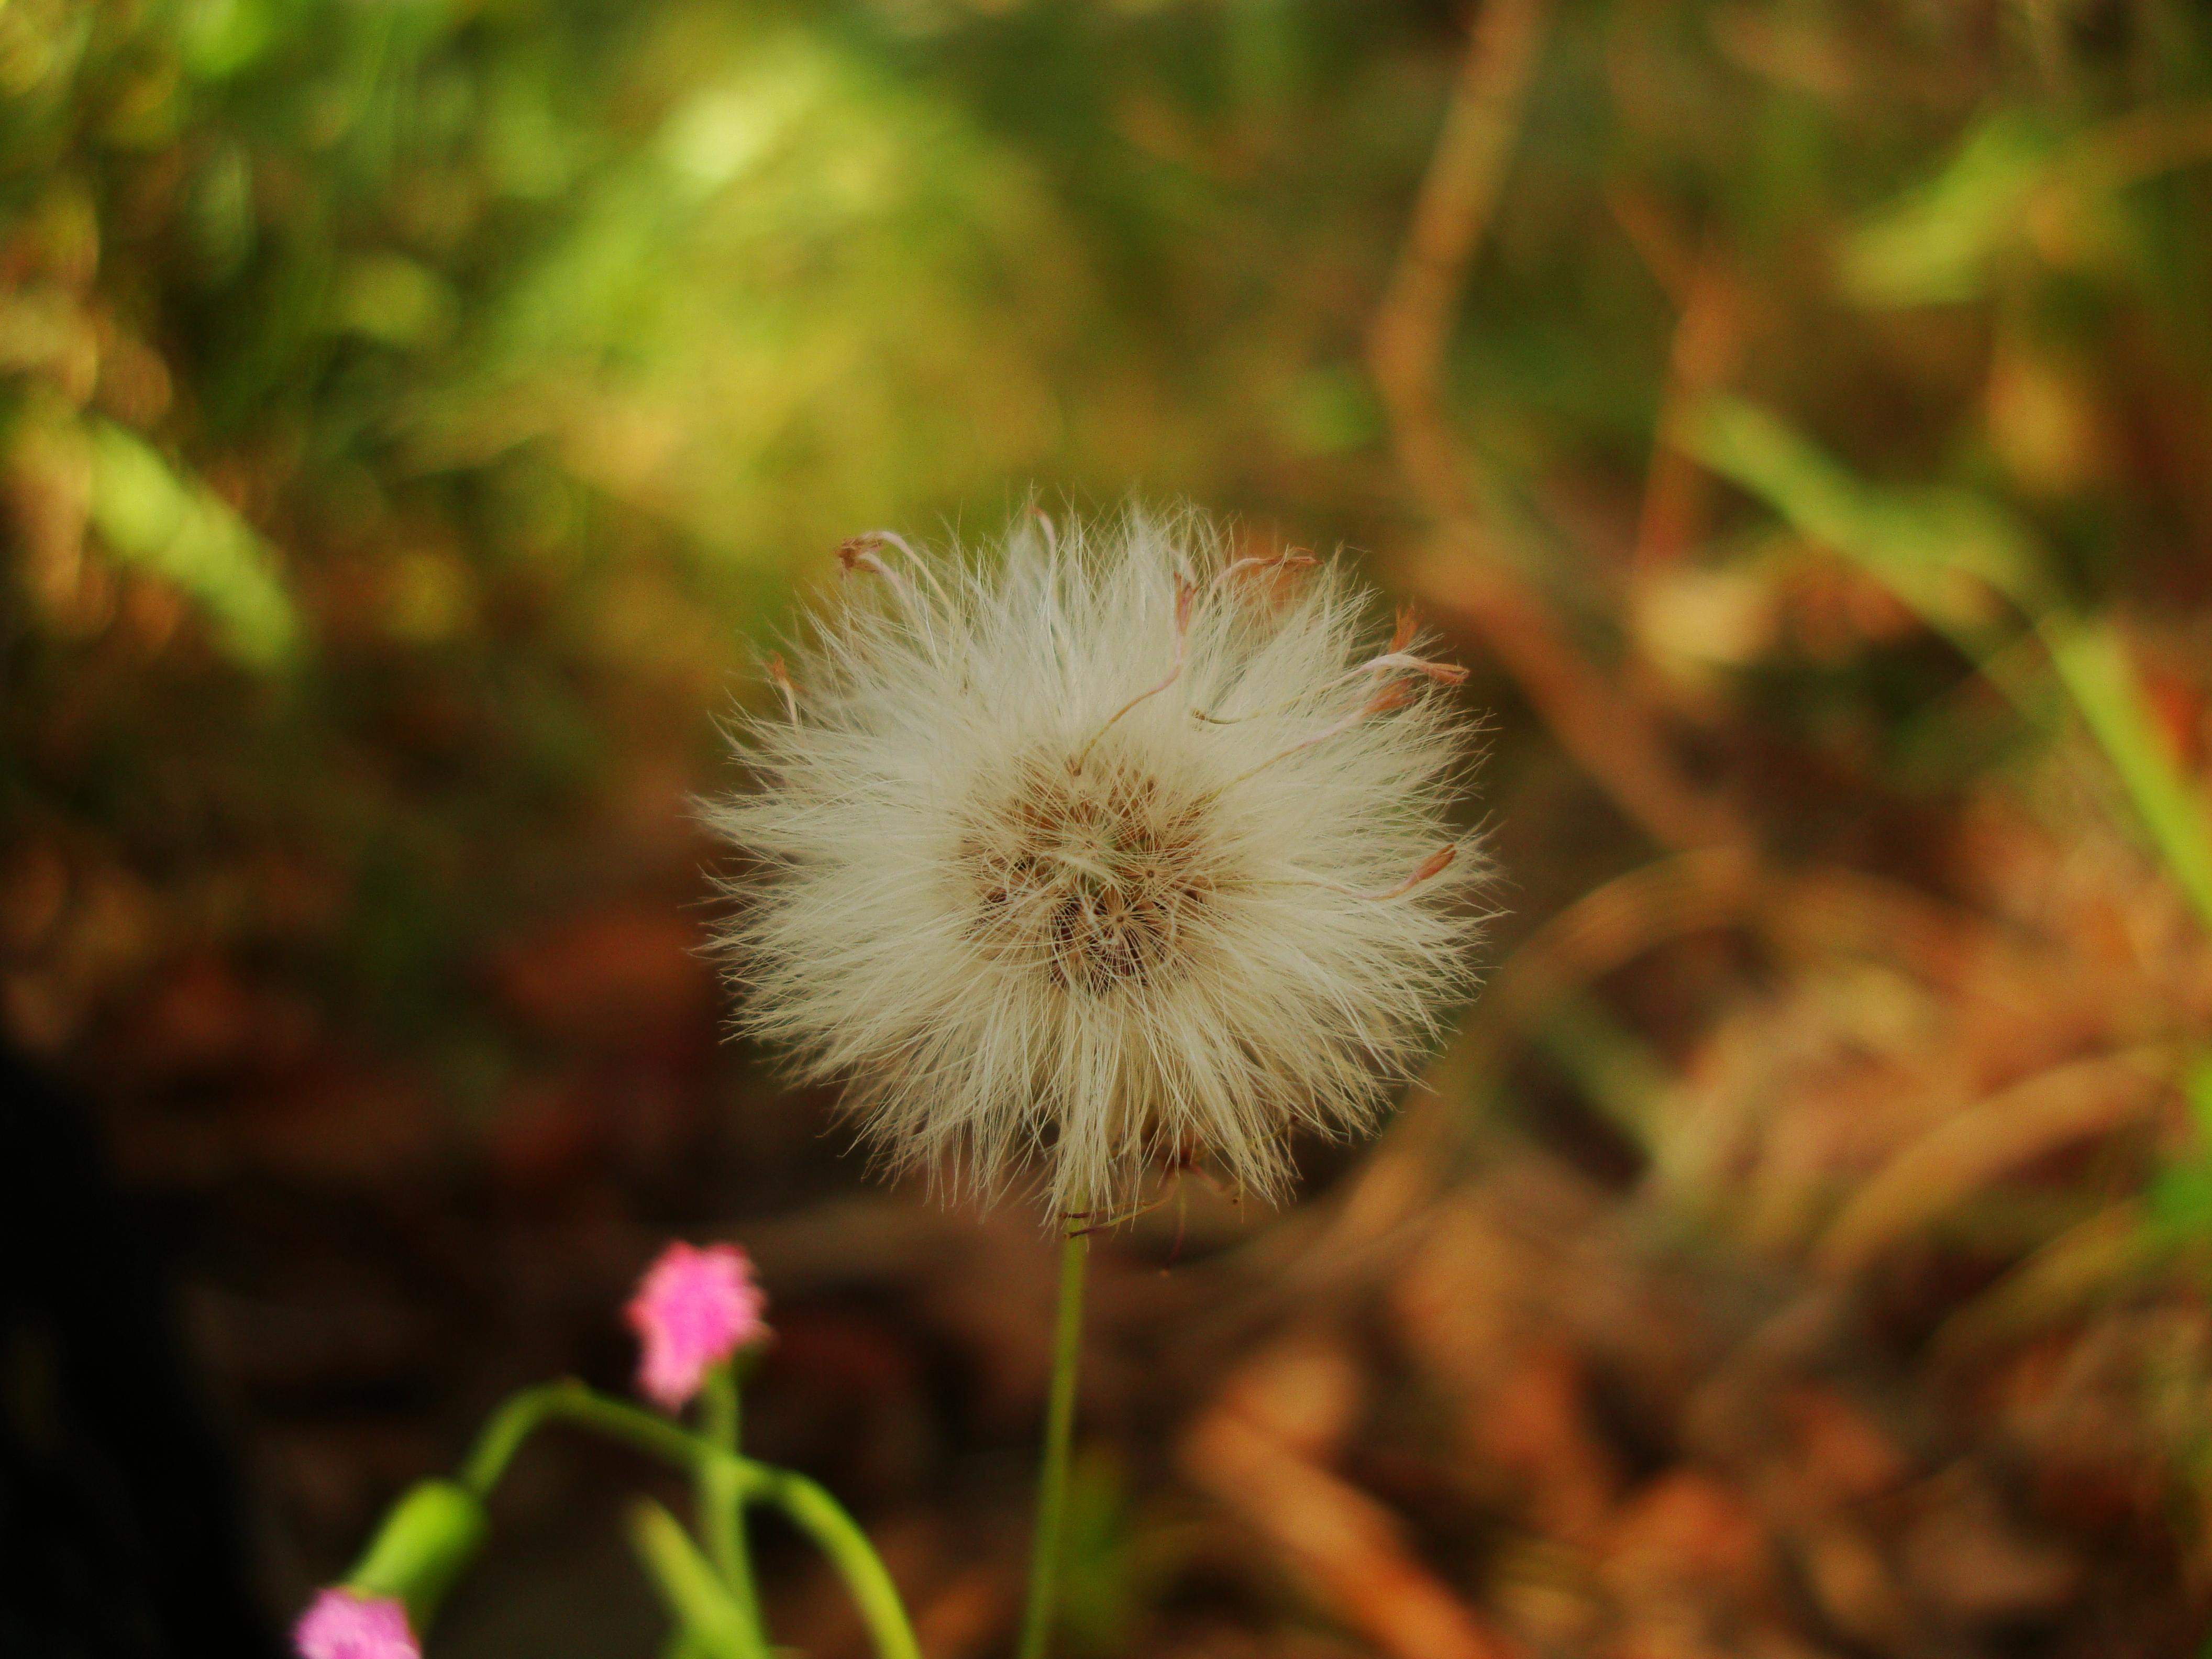 Tiny Flowers Daisy seeds Noosa Australia 08